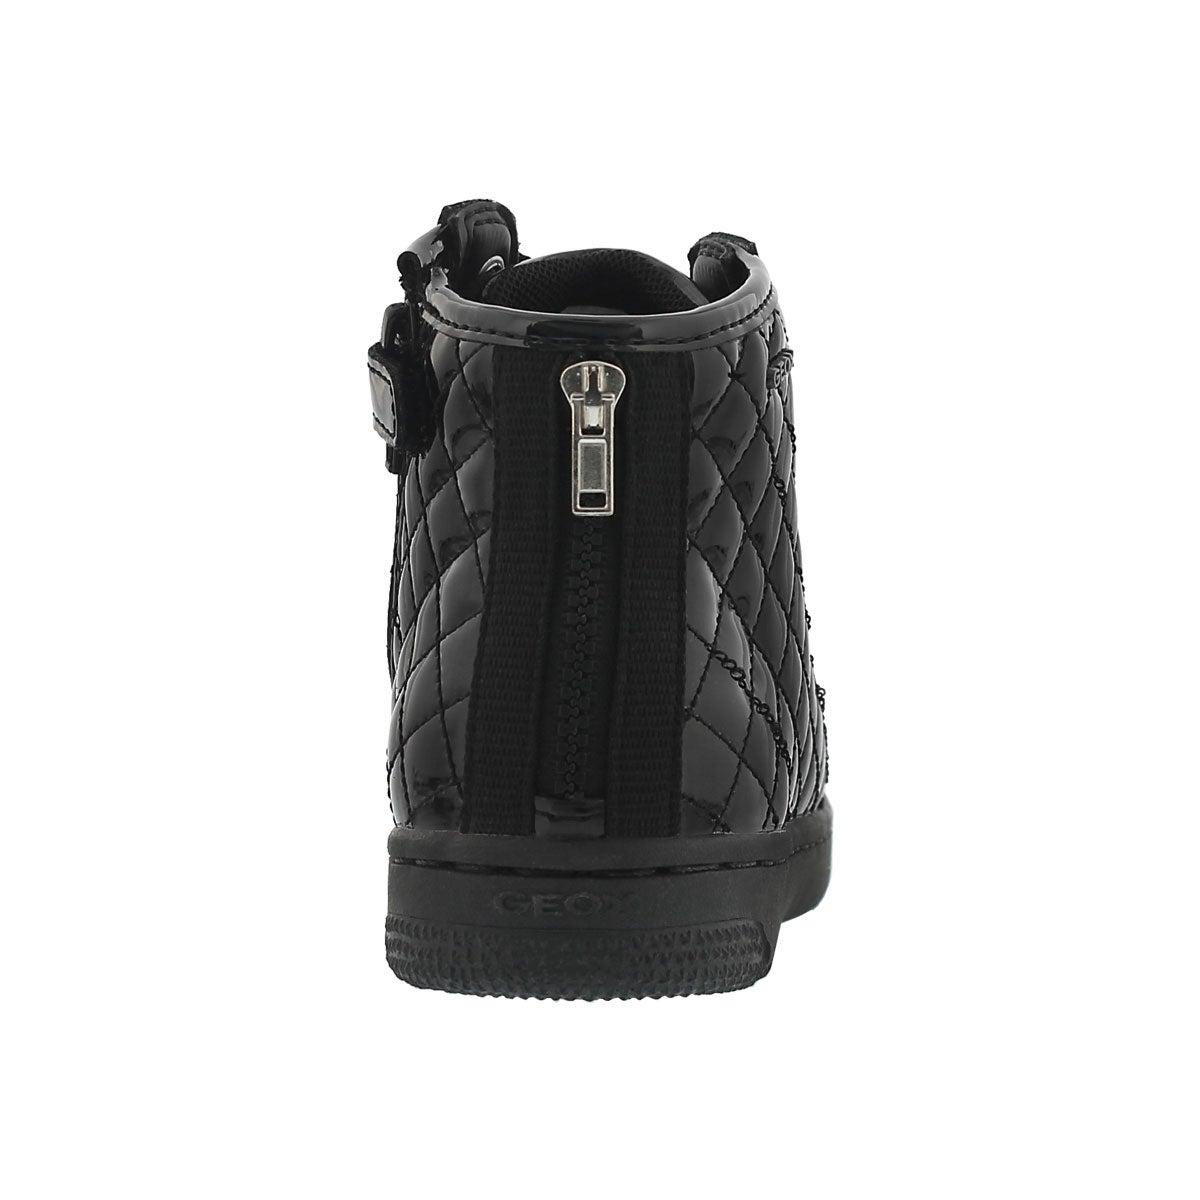 Grls Creamy black high top sneaker